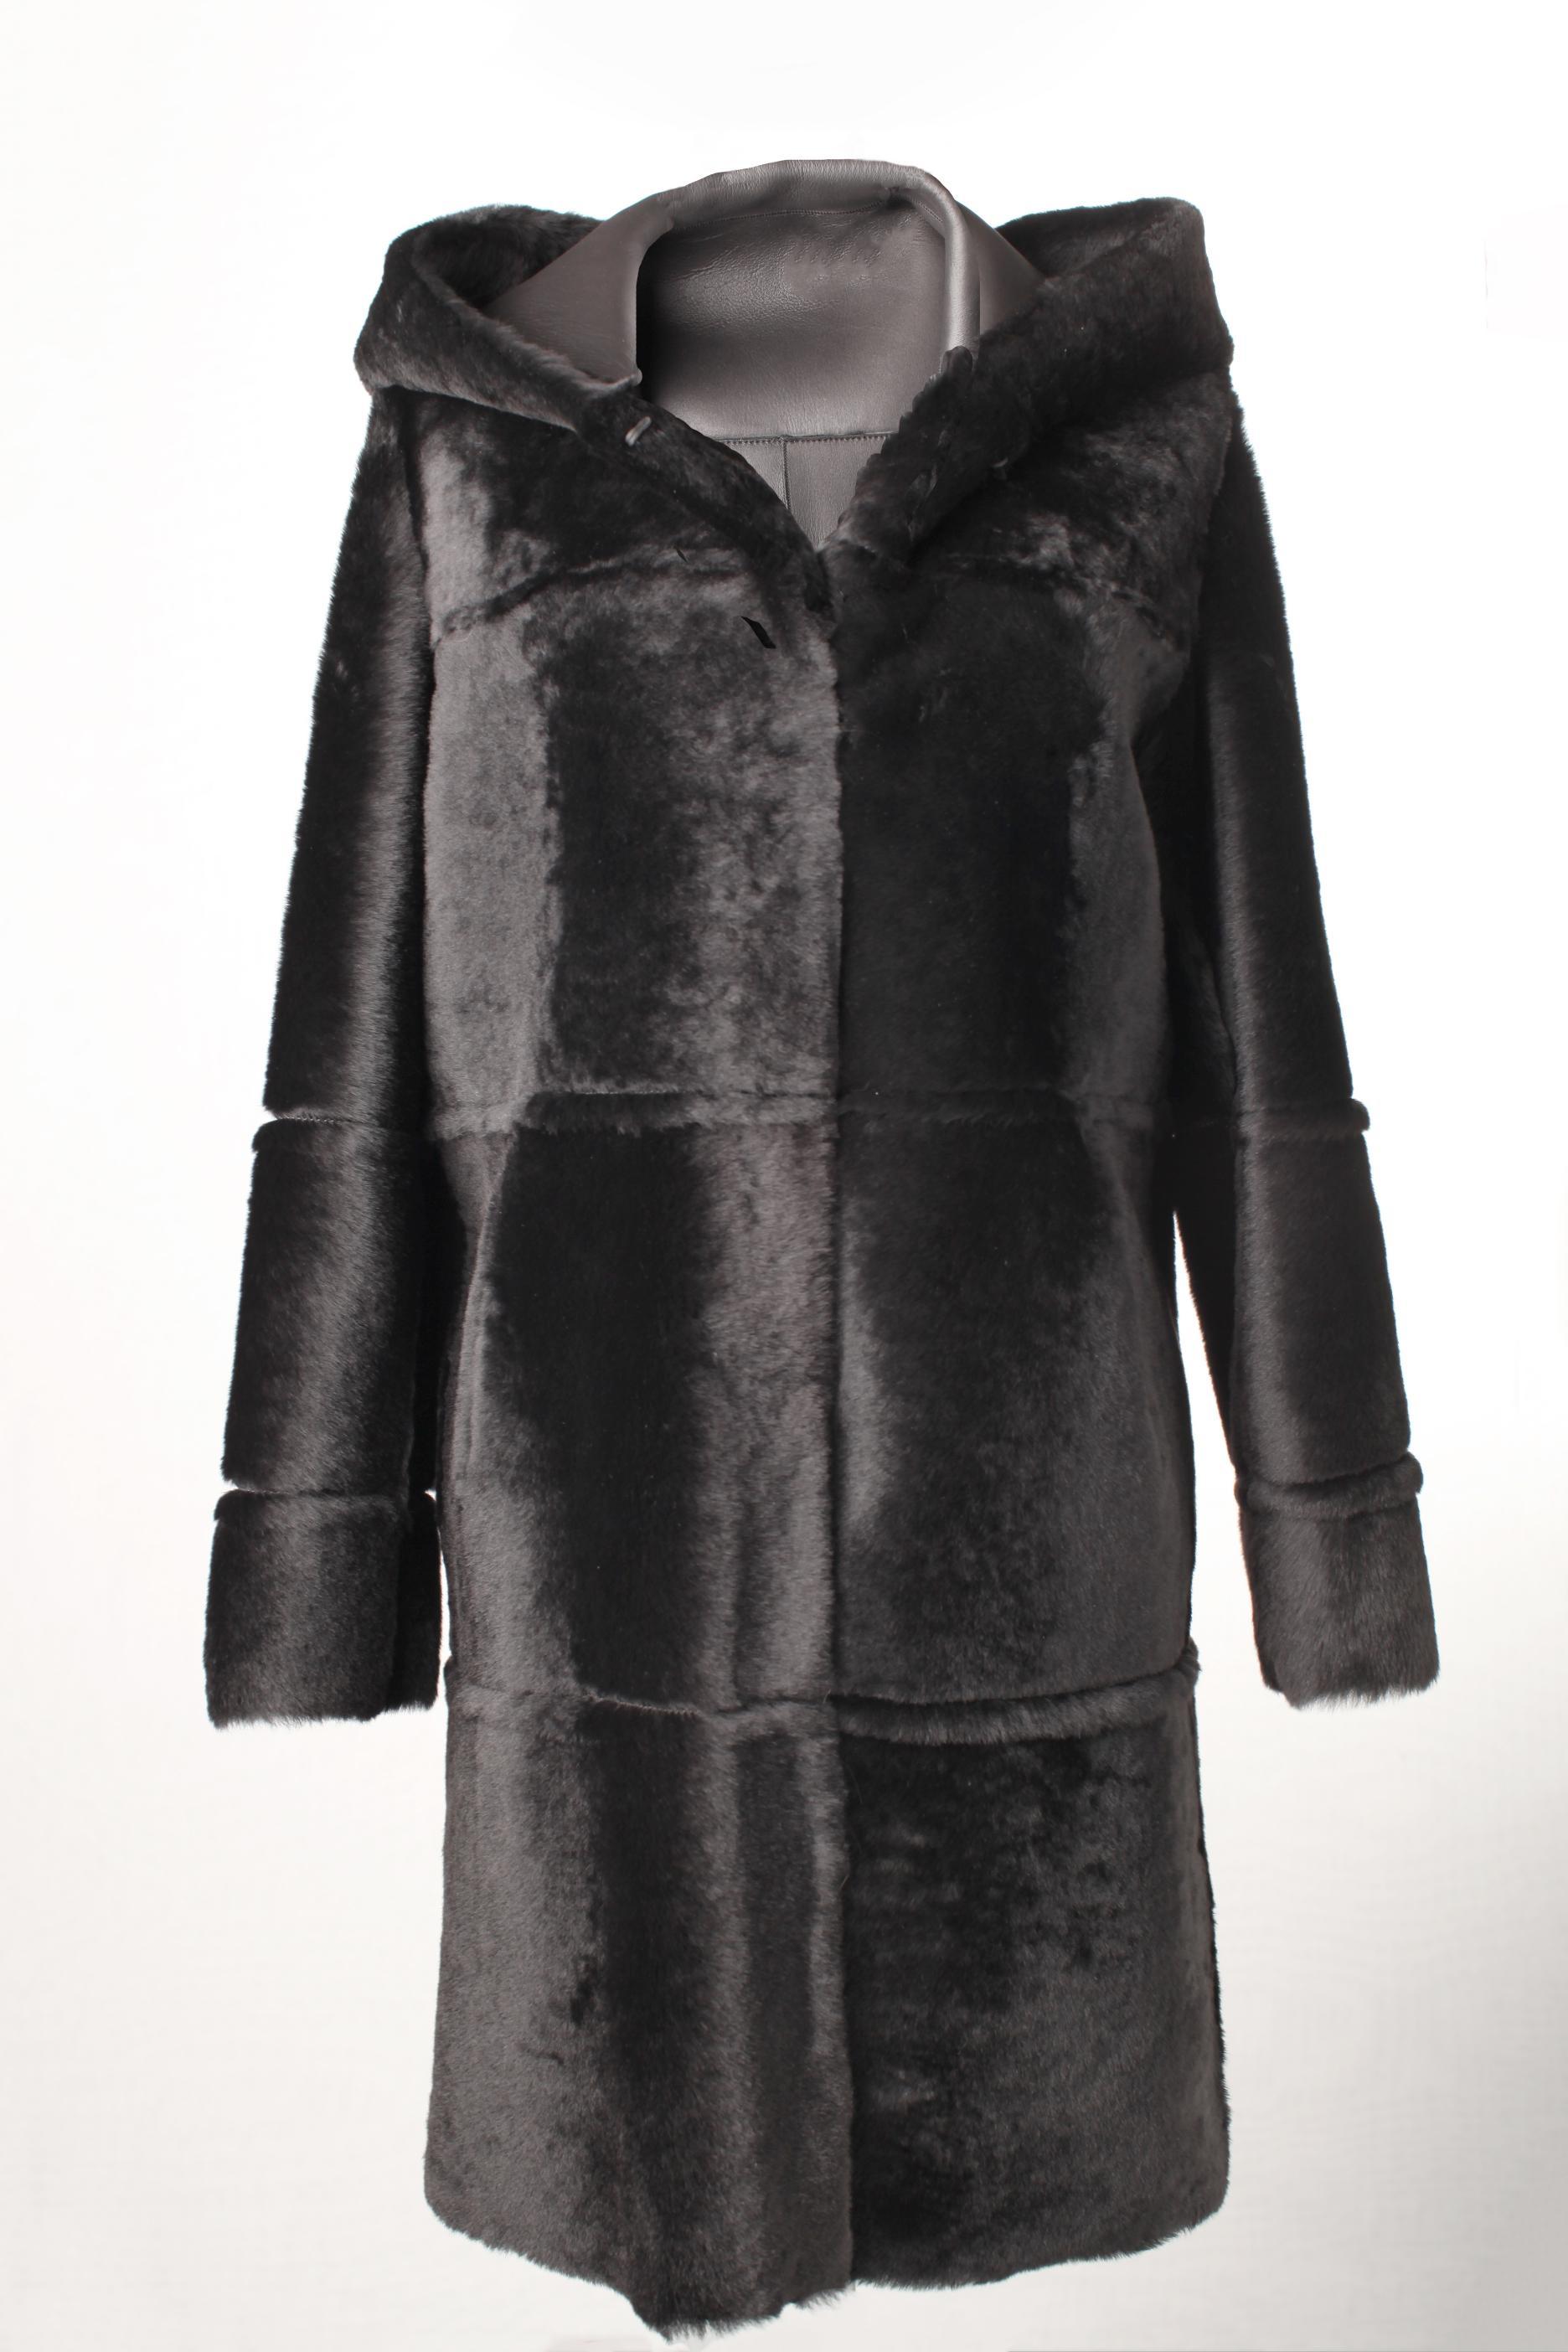 Reversible ironed lacon black silky 93cm